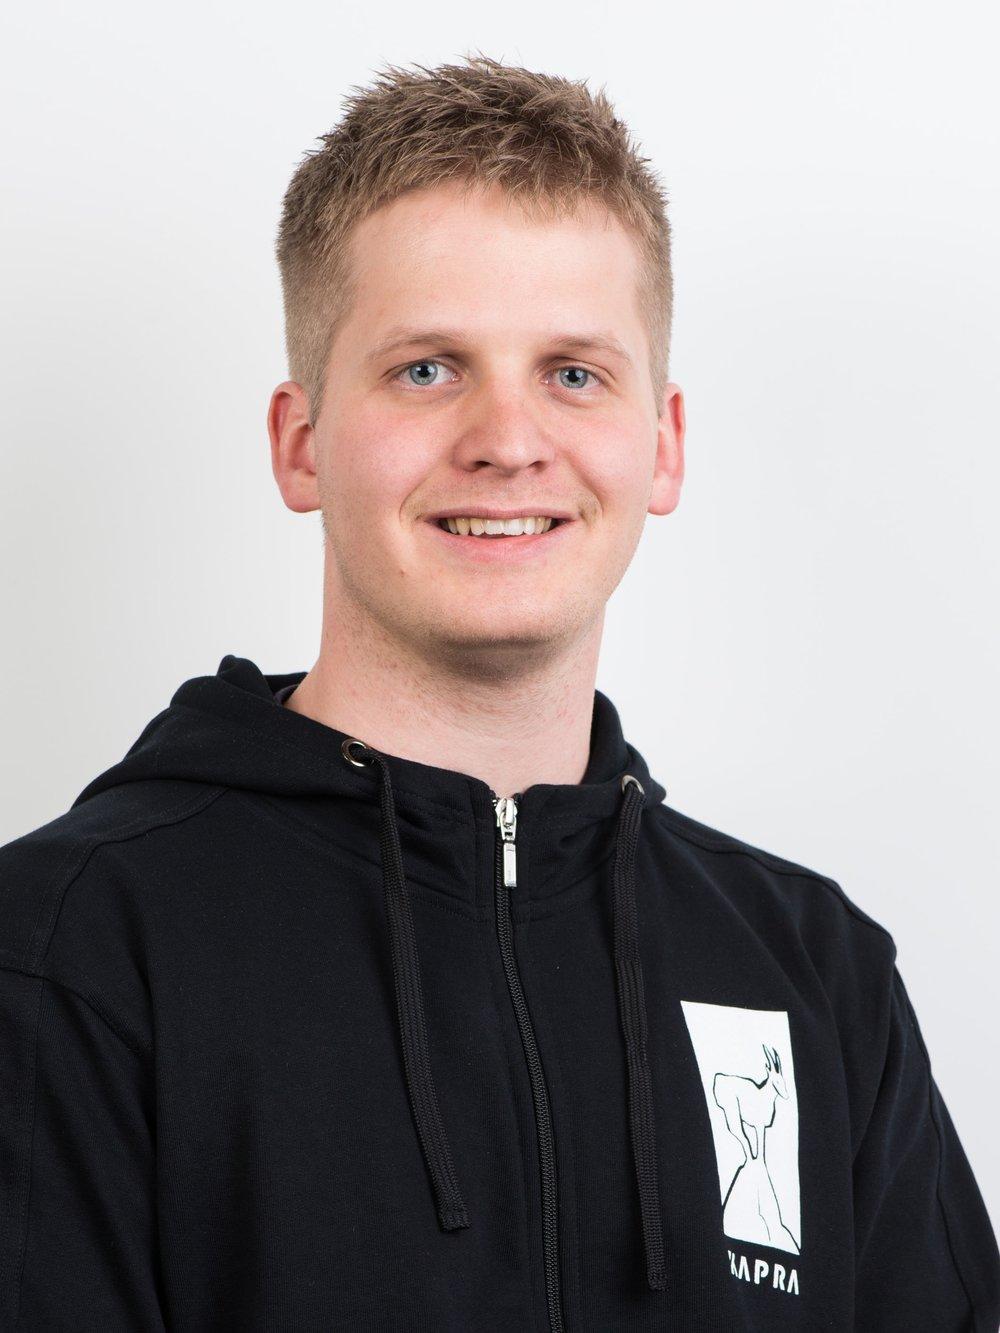 Jens Gunnar Slettedal